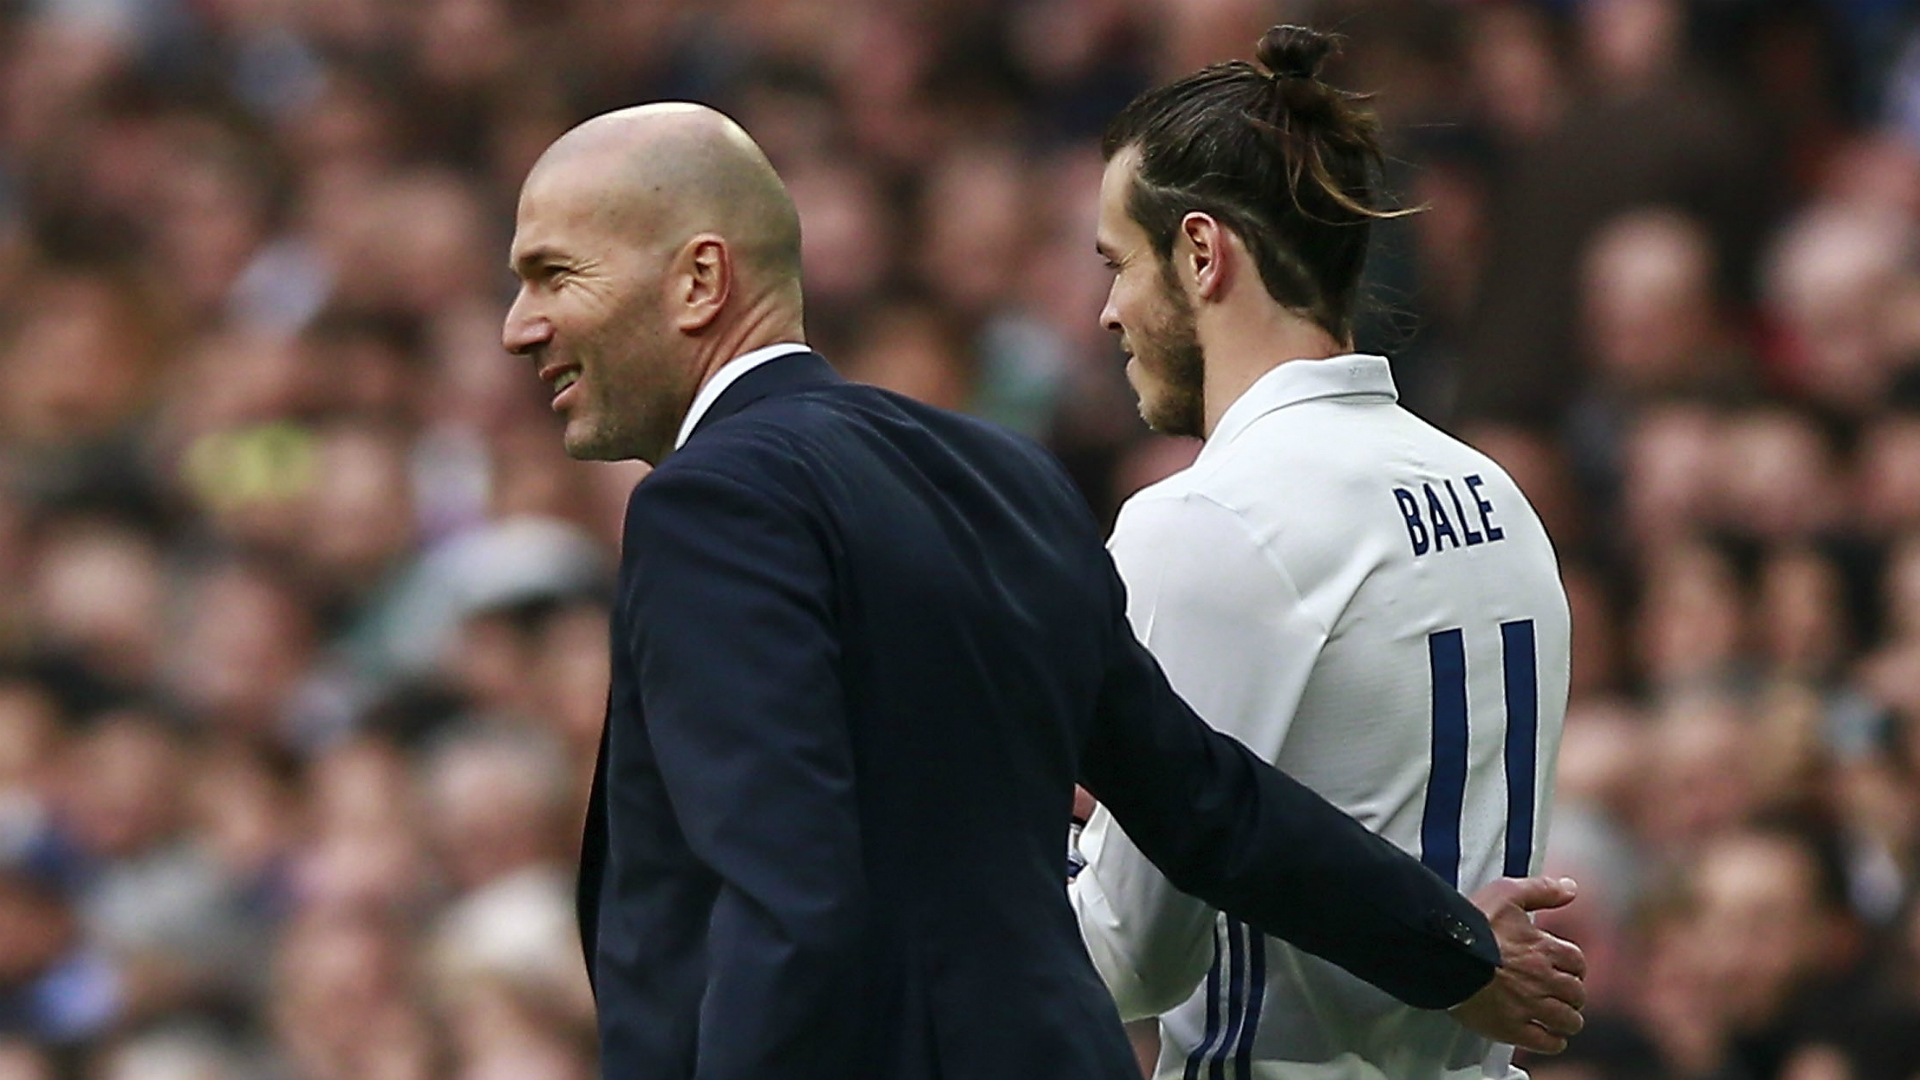 Madrid boss Zidane rejects Bale's scapegoat claim